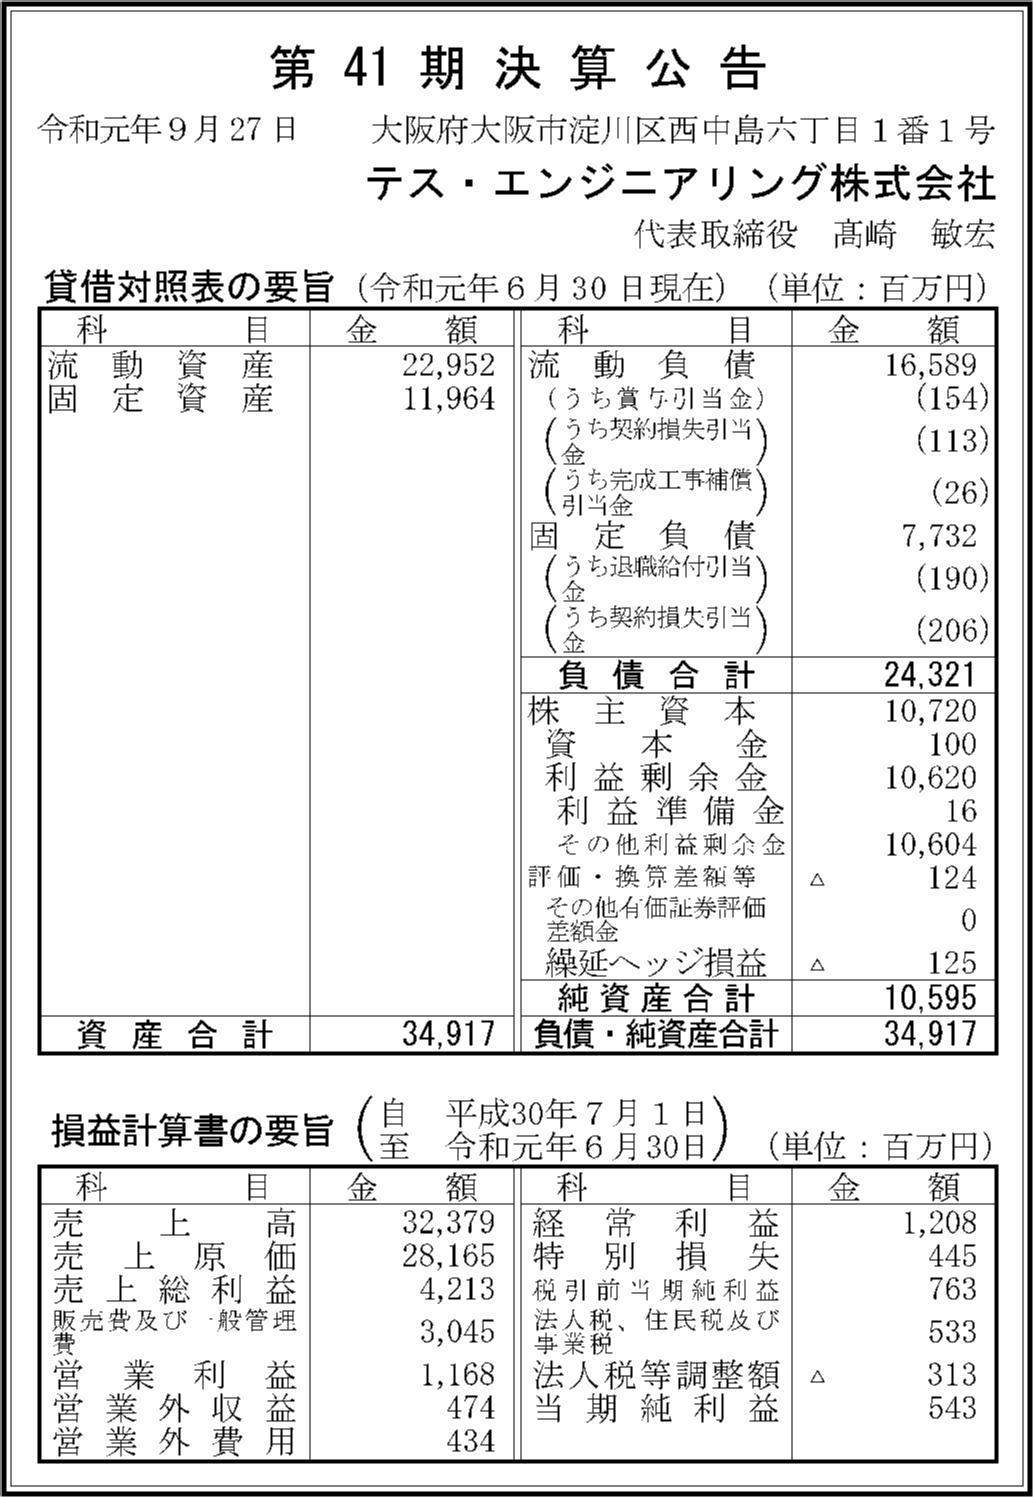 0126 161d2dfb72fadc3ff176a1d4930ba33bcf2aab46dcfdbe22ca496e056f84fc9d822069faebc76d83bf6bd5f56f0c80cd1f4ef0fa221ba582e3c9226295eaa854 06